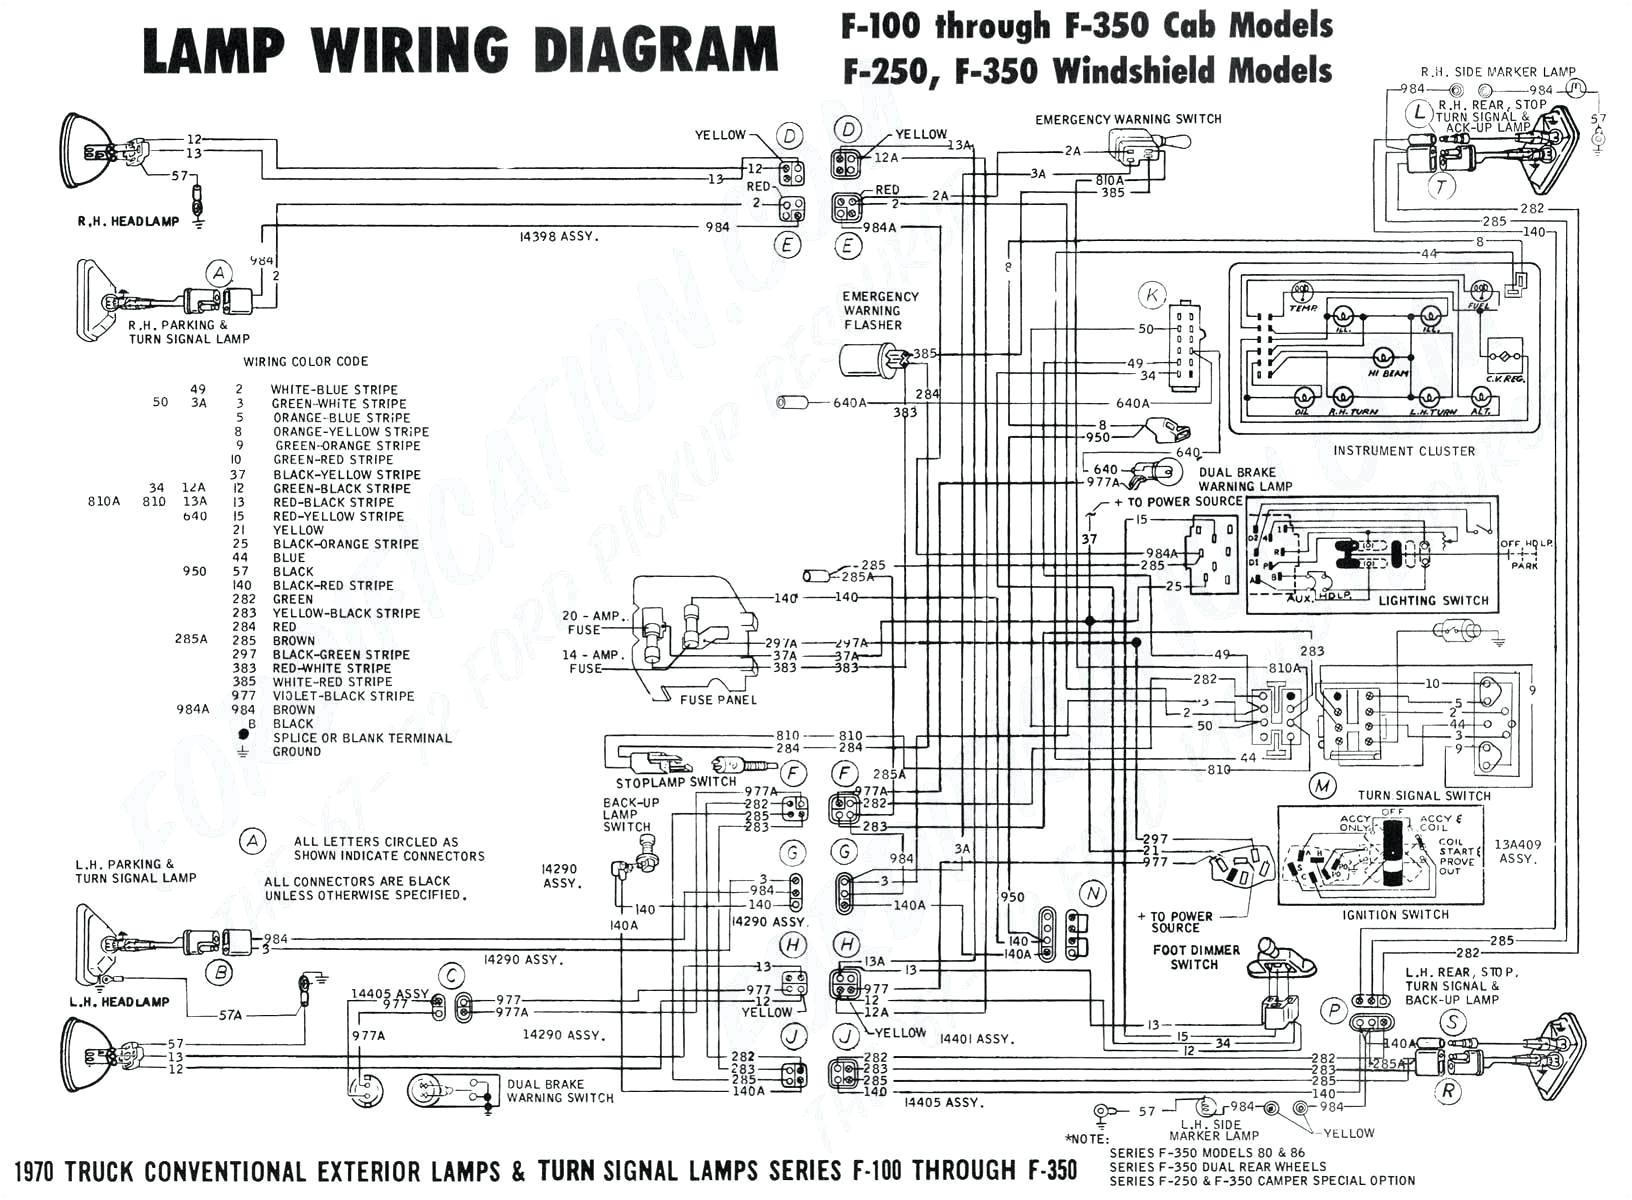 cadillac kes diagram new wiring diagram nissan kes diagram